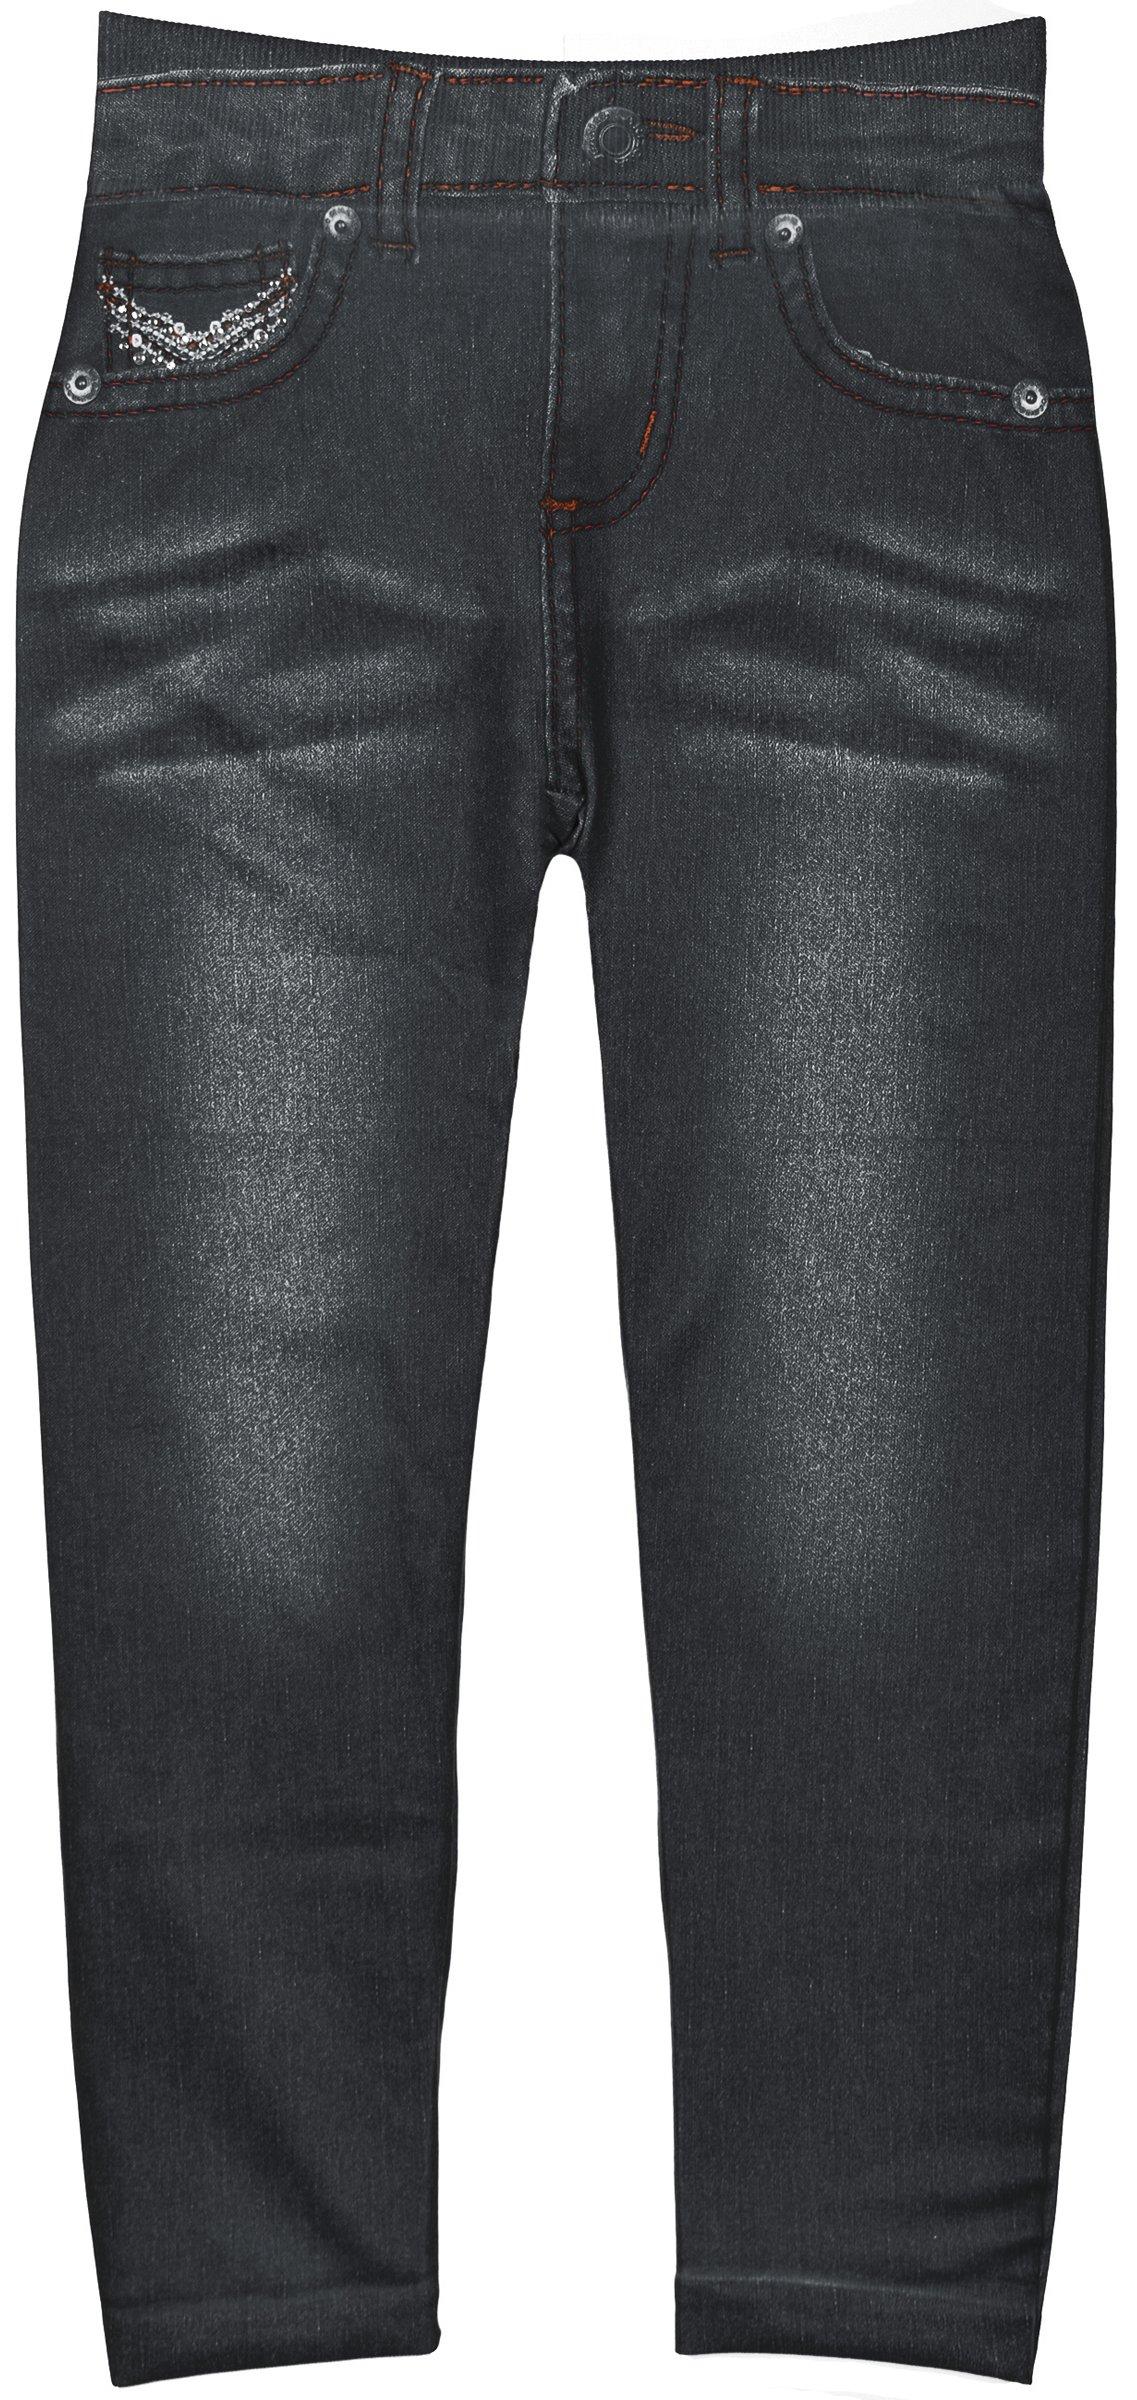 Crush Toddler Girls Blue Jean Print Leggings in 7 Fun Styles in Sizes 2T-4T (2T-4T, 22489 Black)